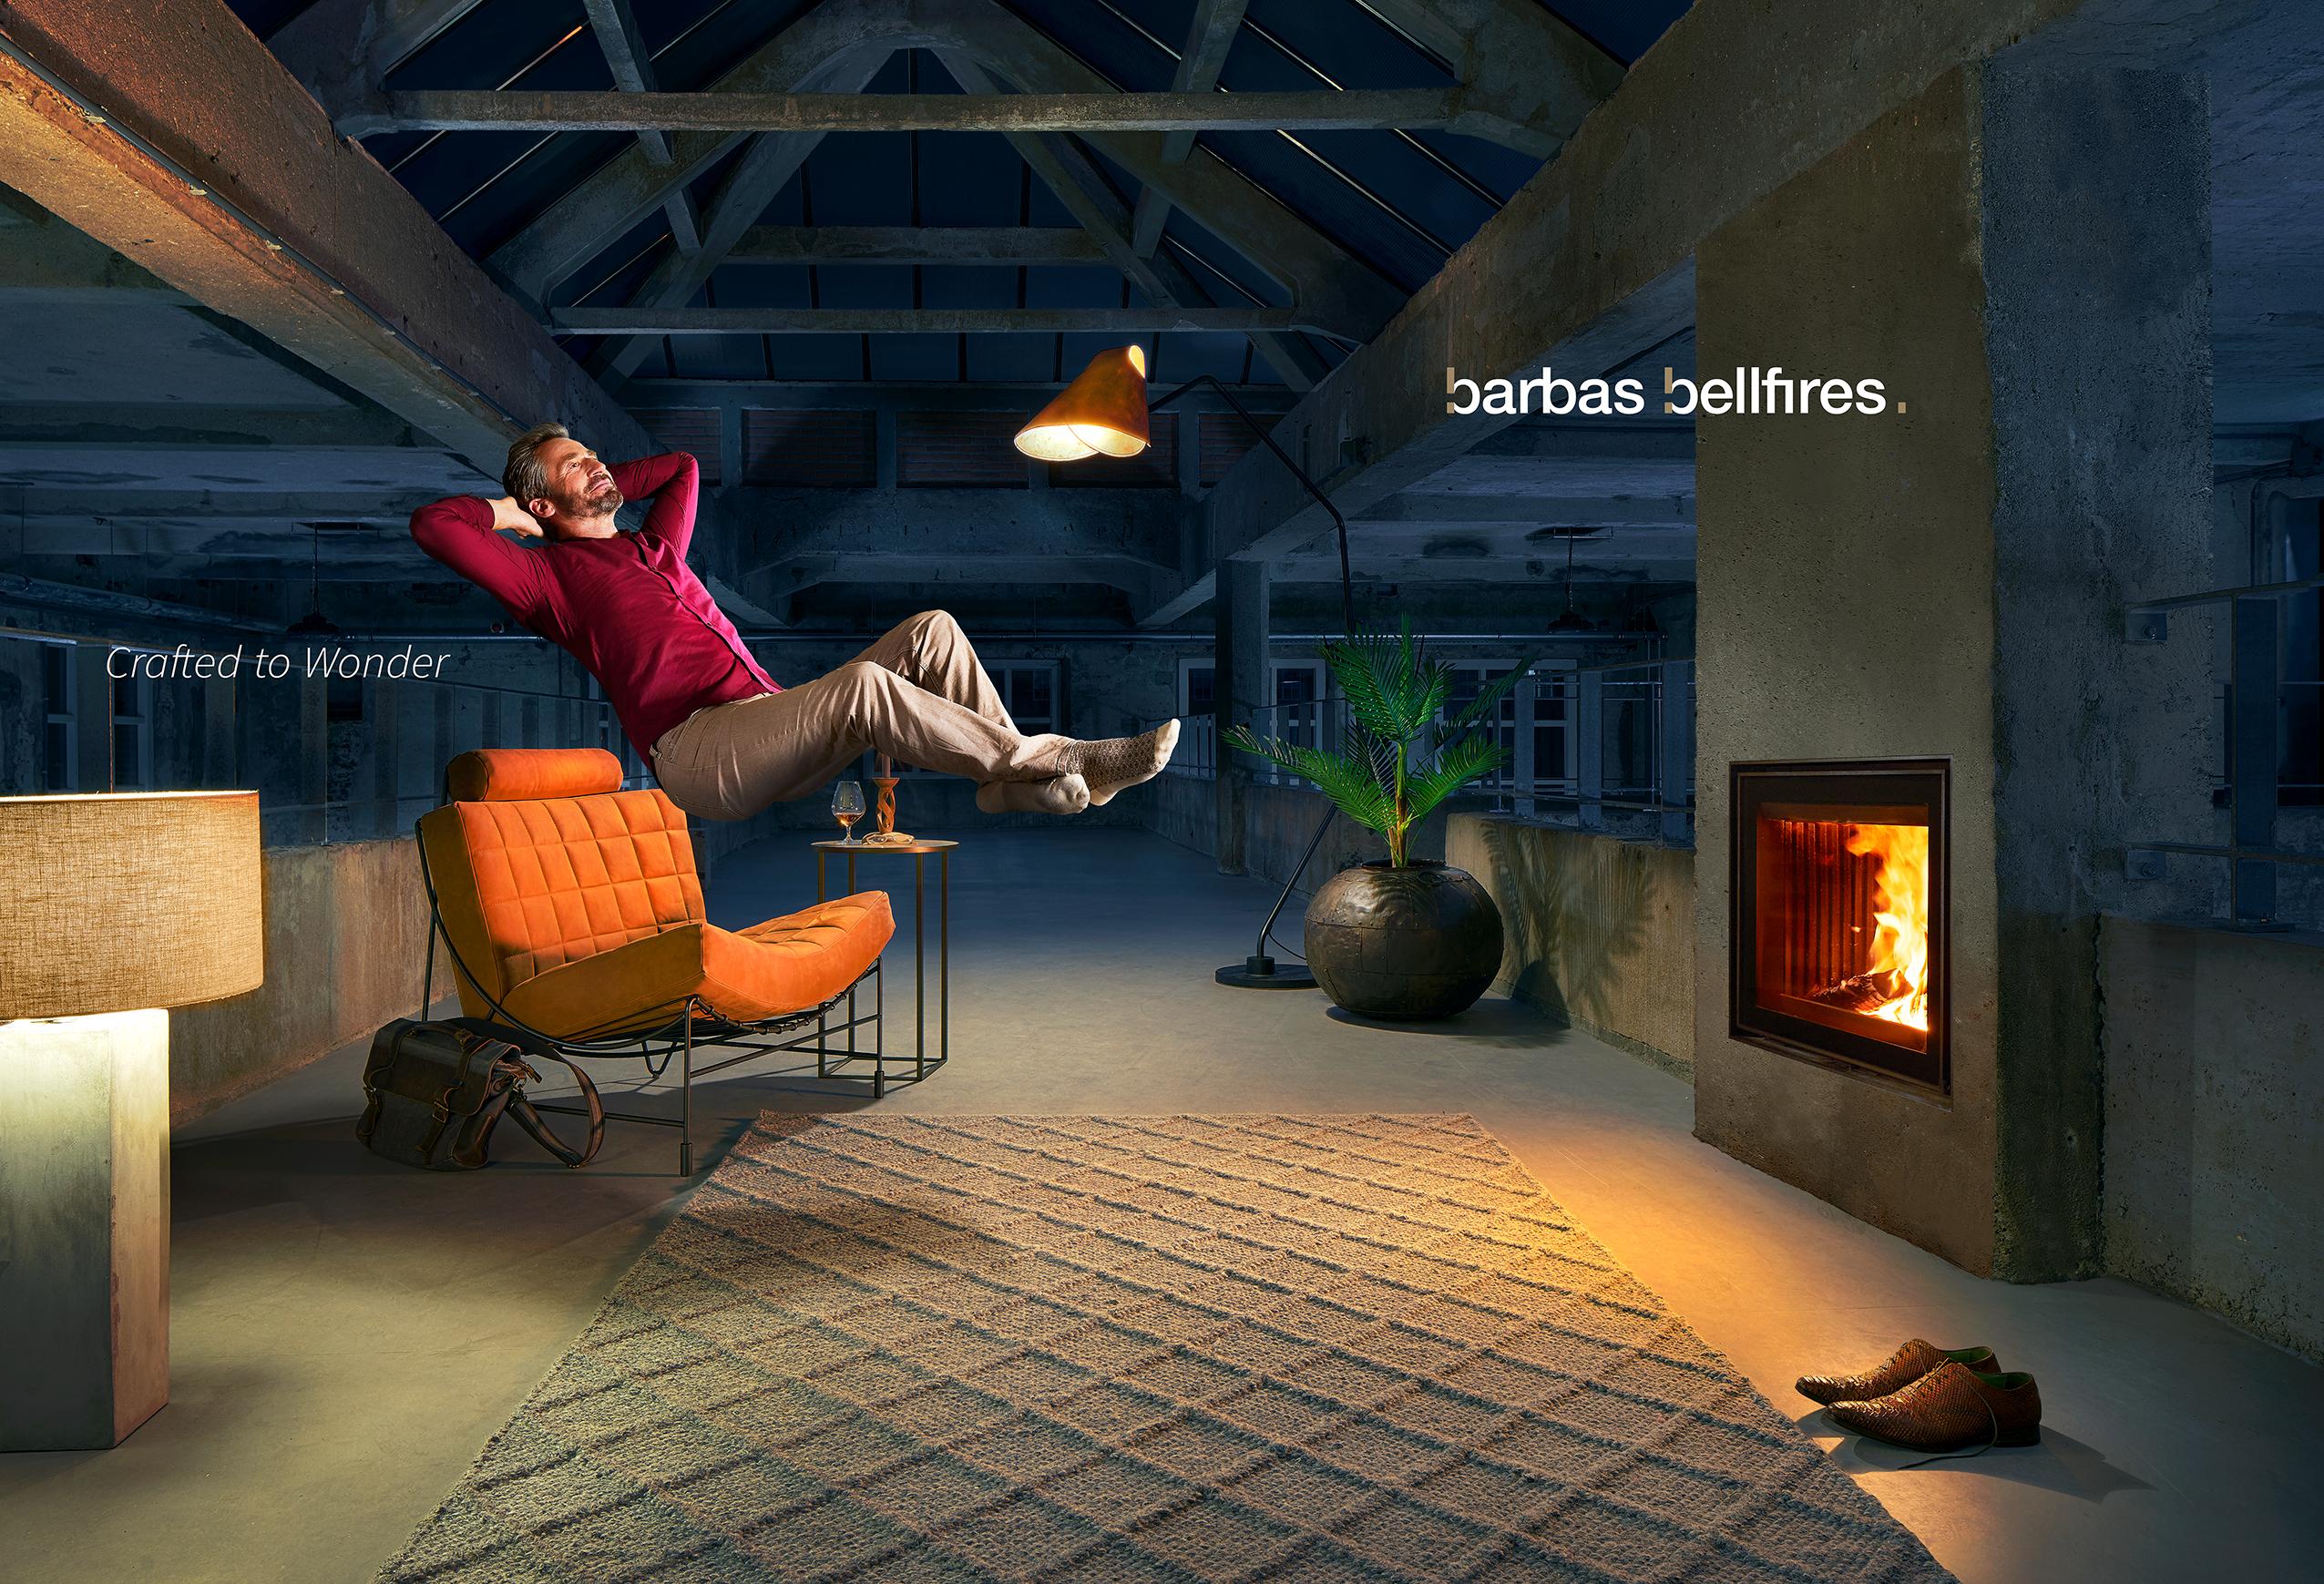 Barbas_Bellfires (c) Isabel Croon man